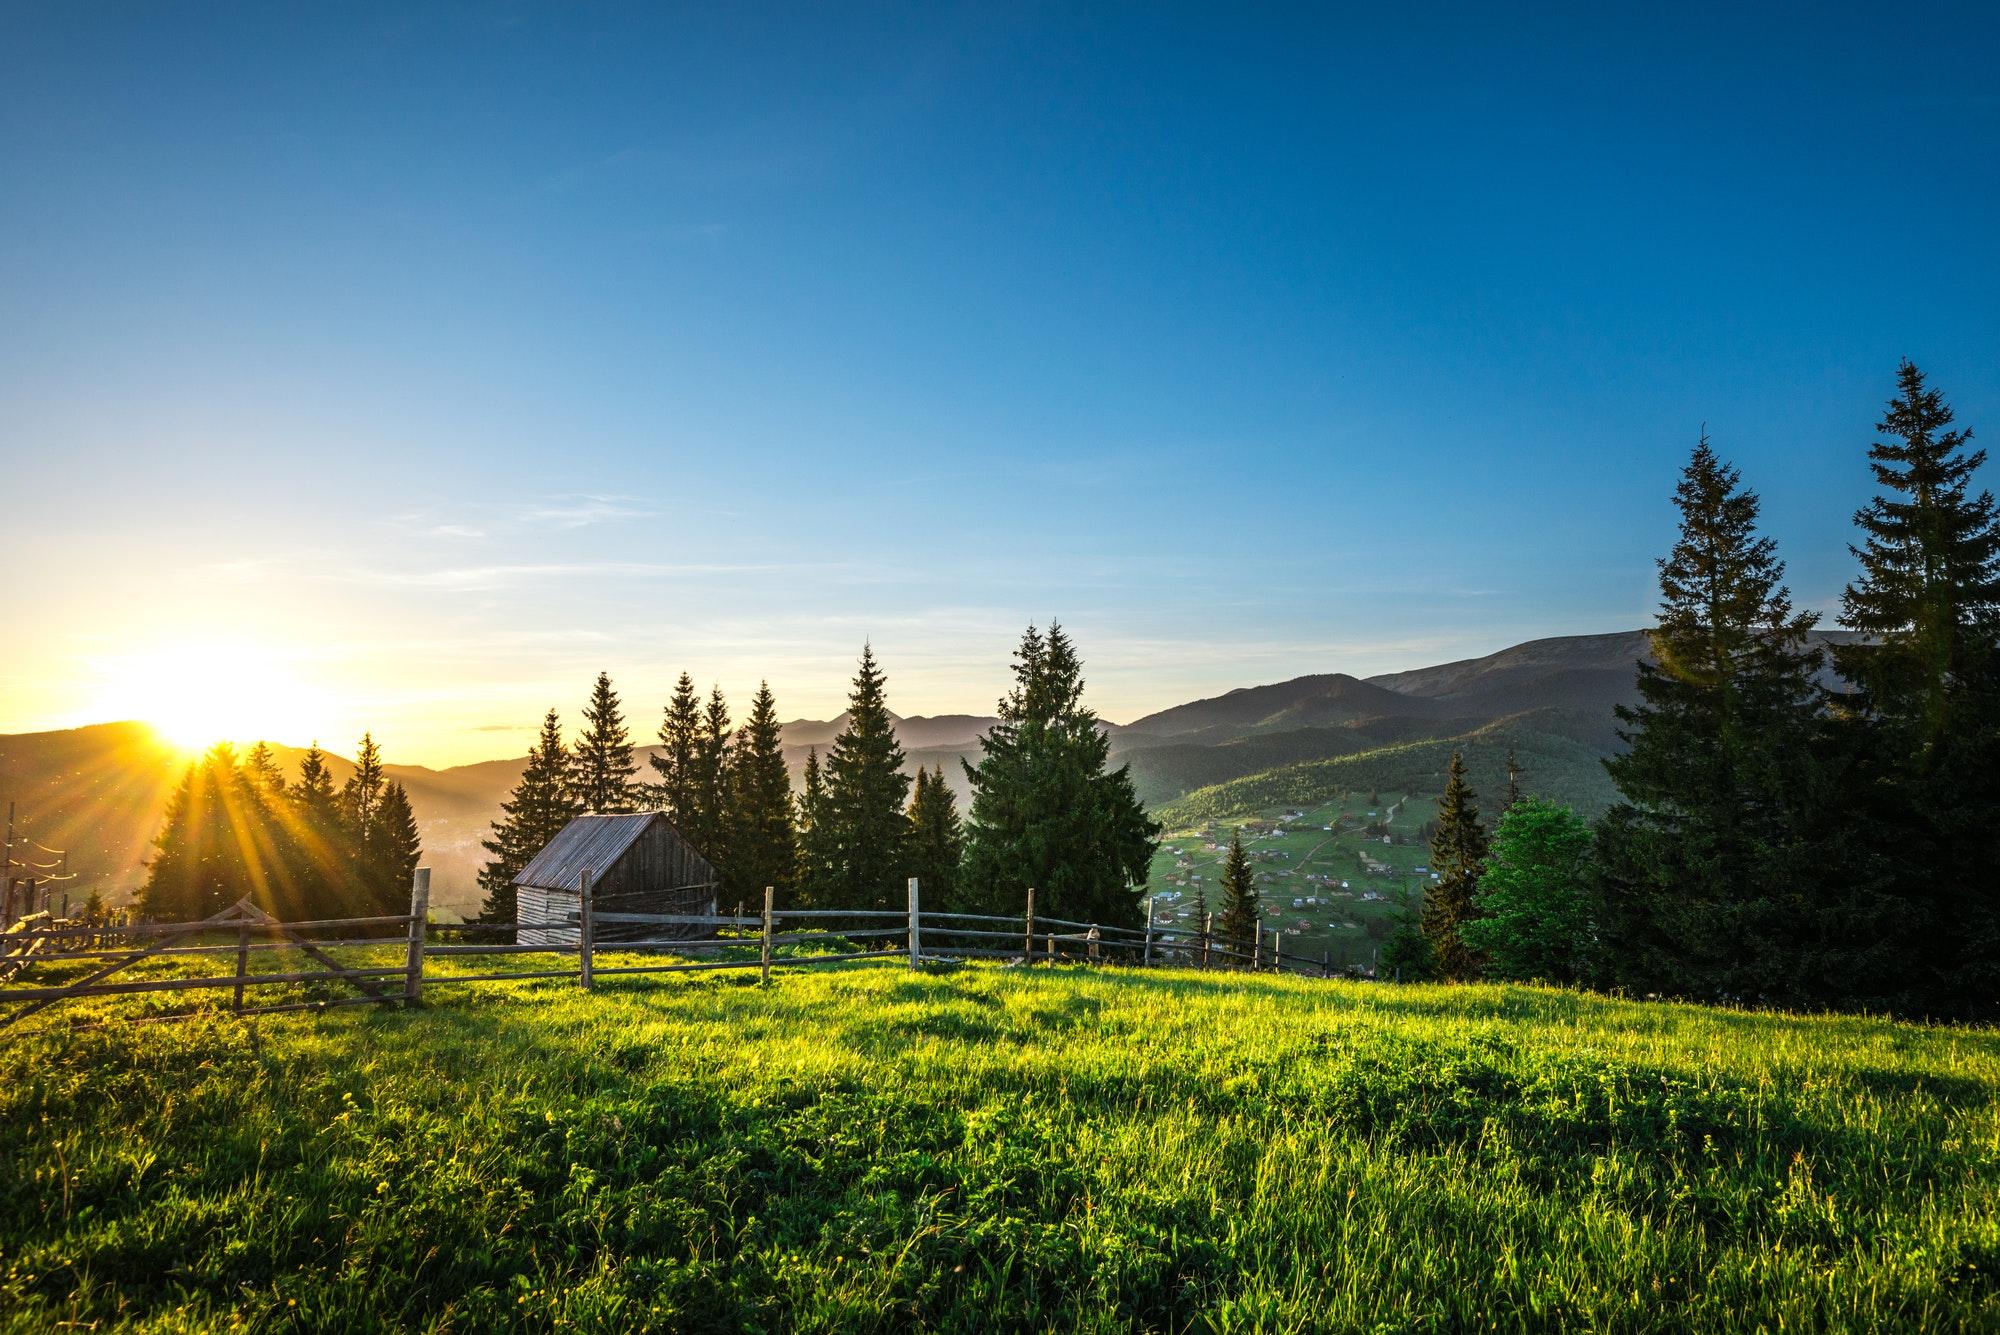 Mesmerizing beautiful landscape of hills